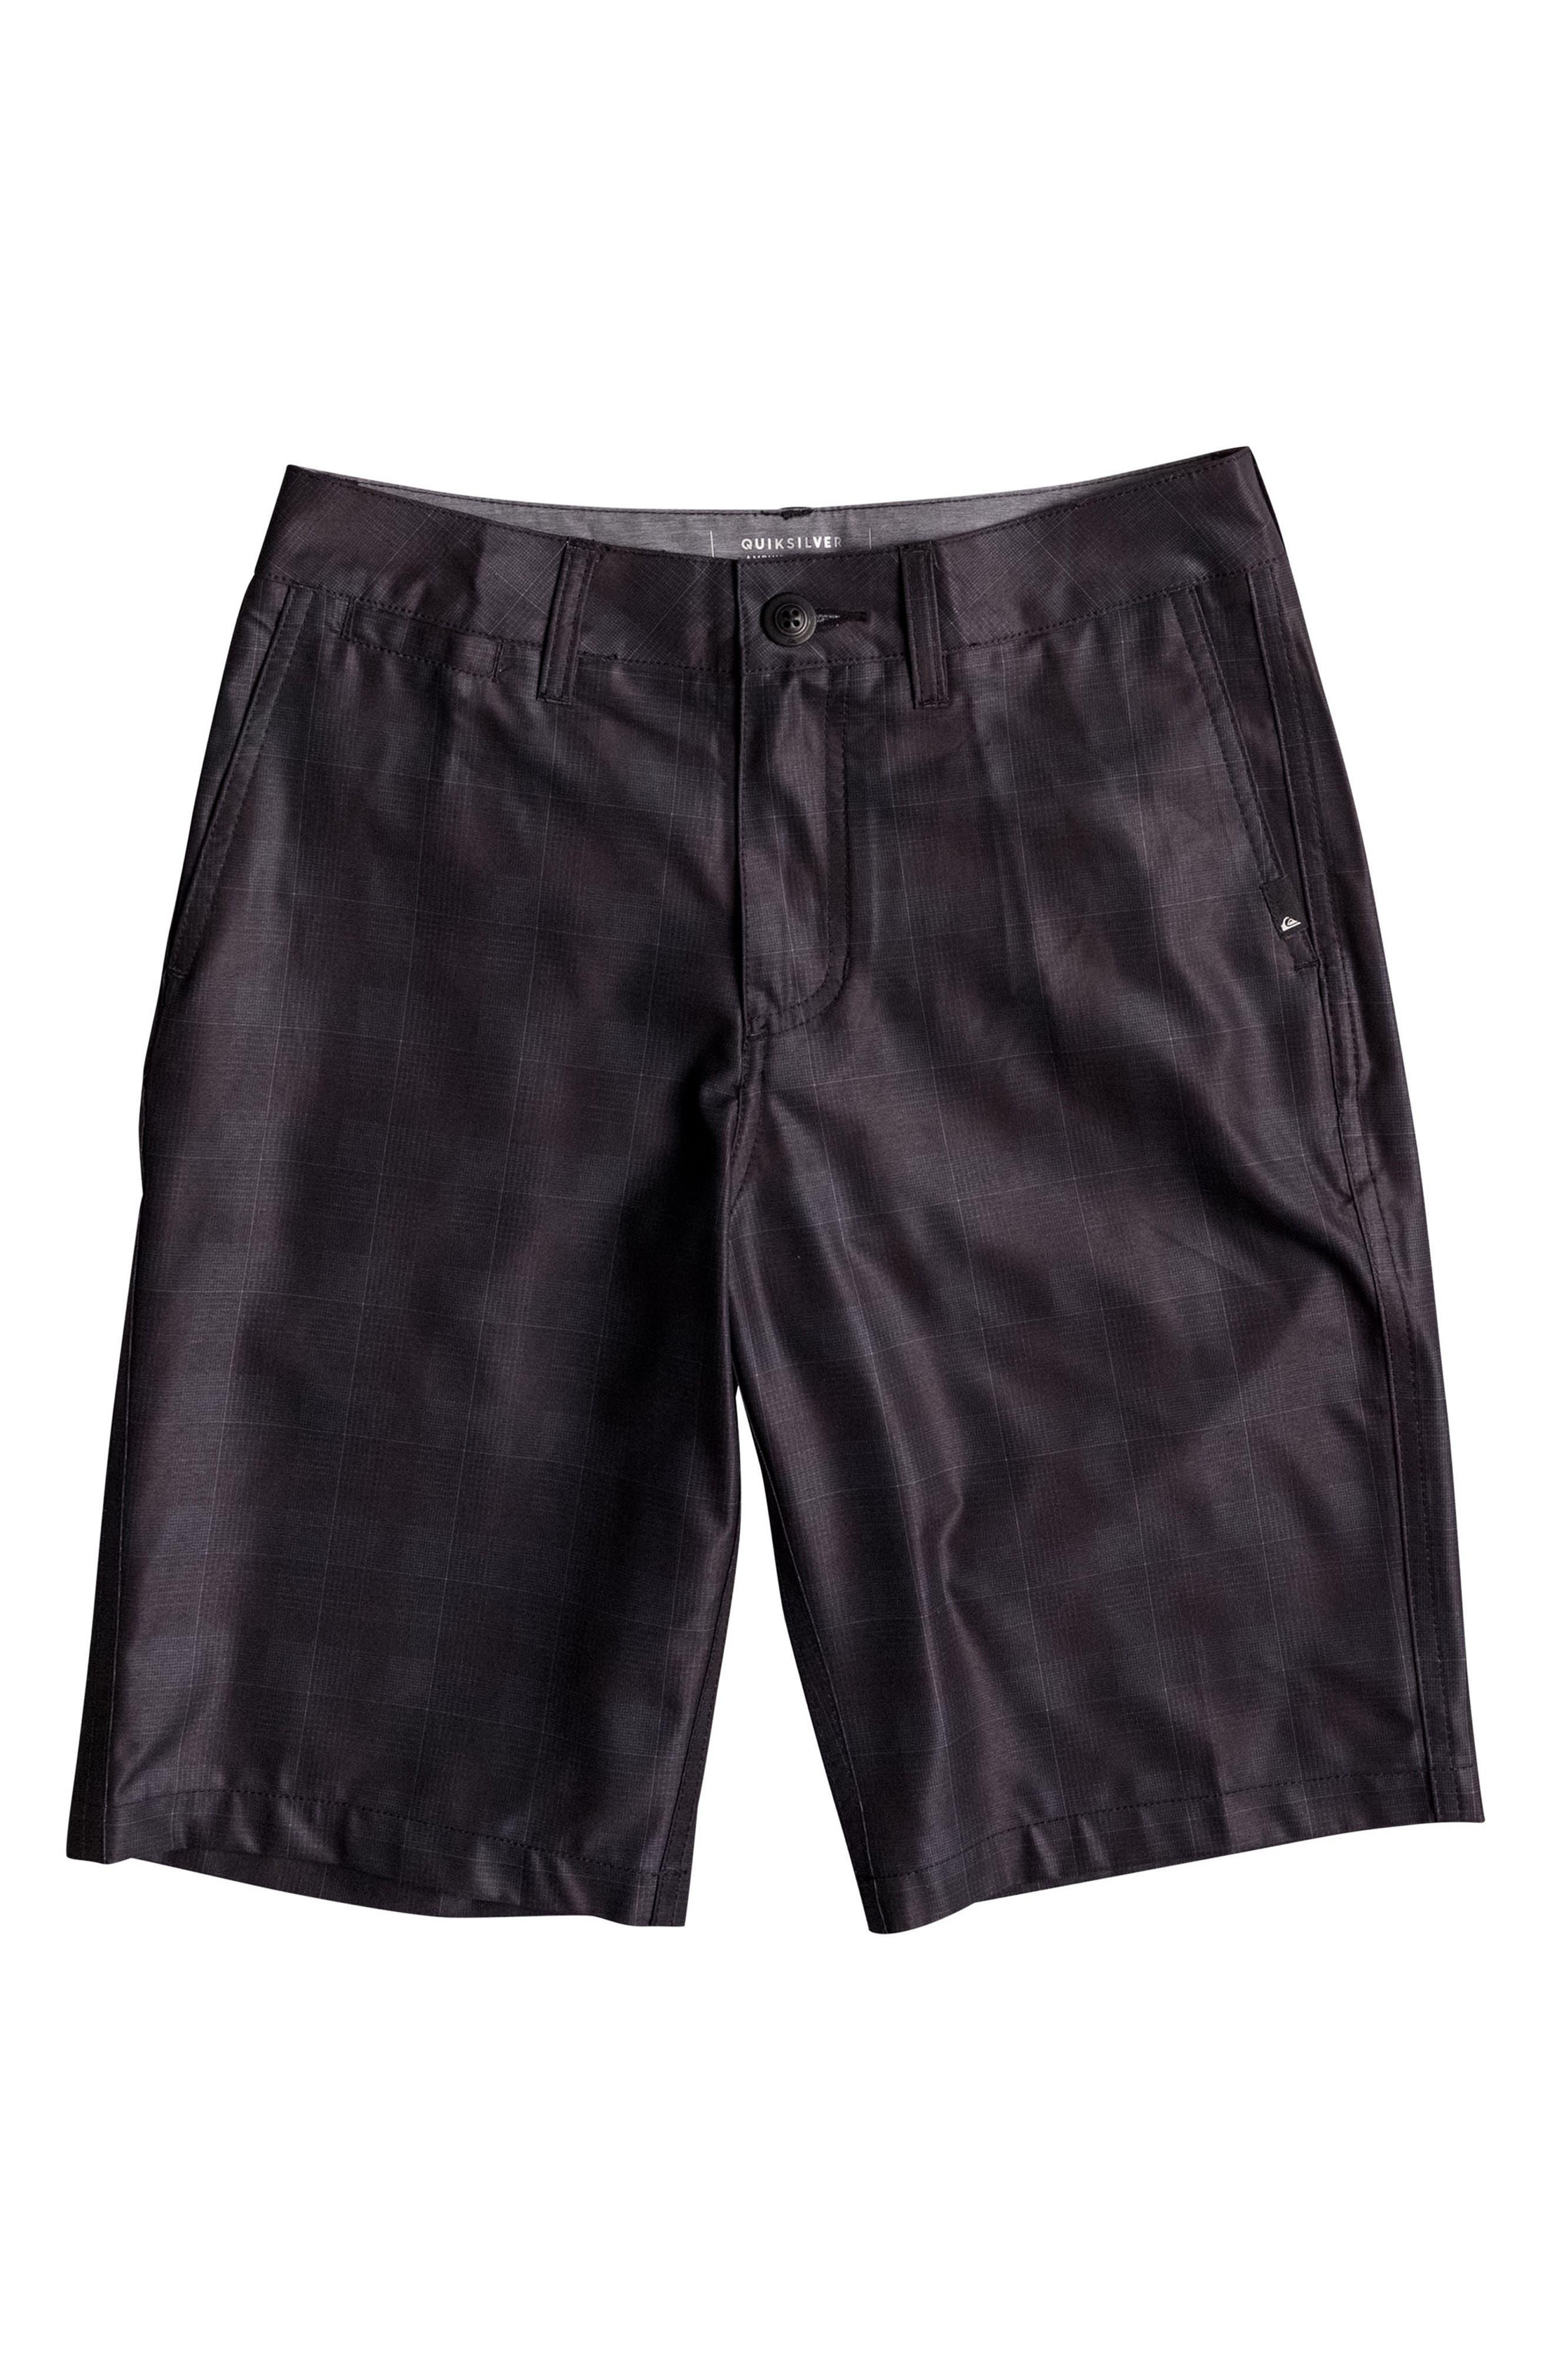 Union Plaid Amphibian Hybrid Shorts,                         Main,                         color, 002